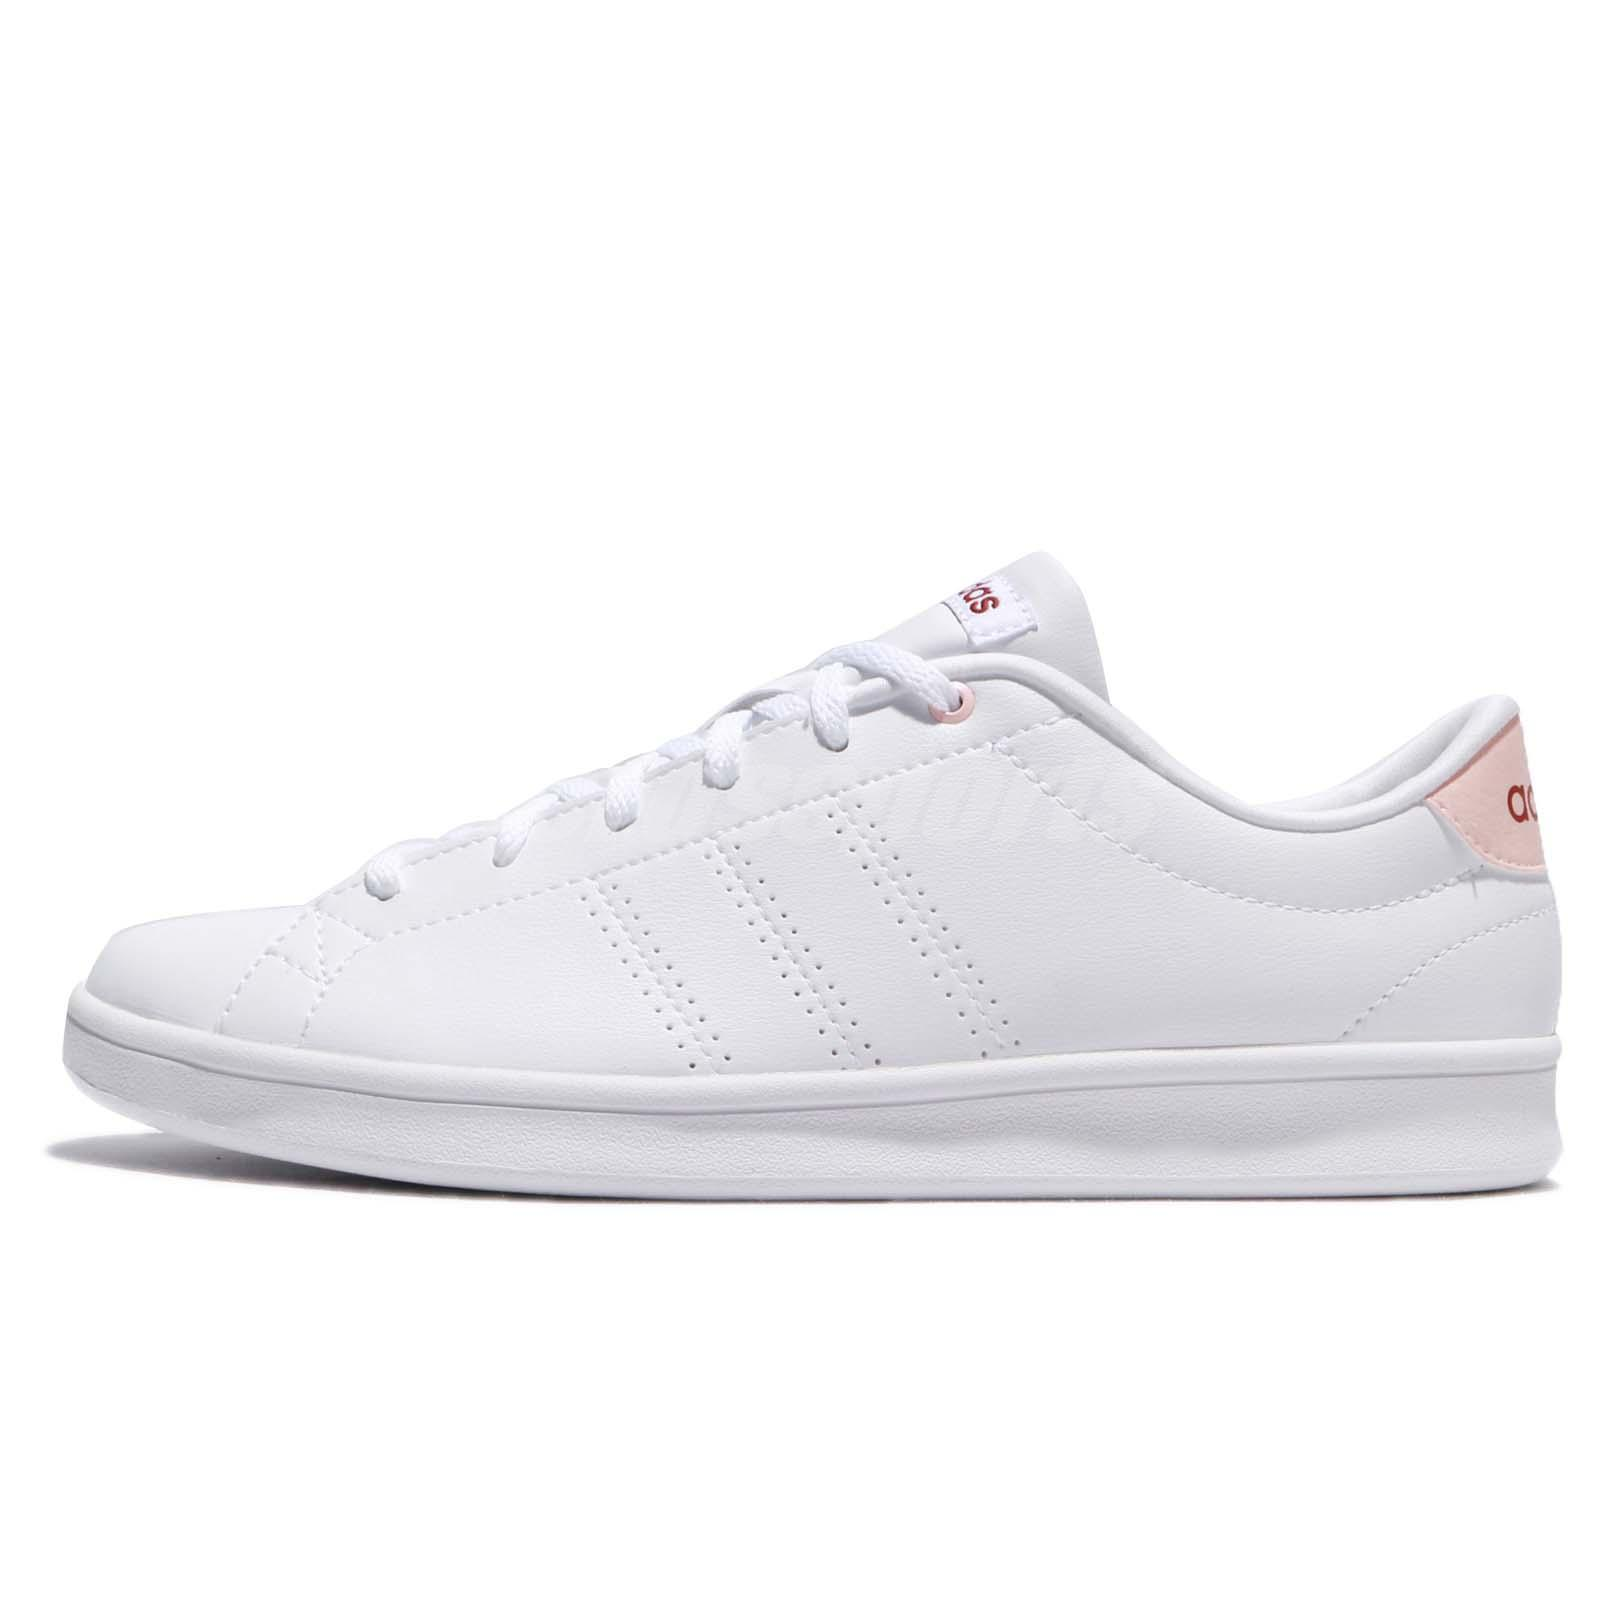 Women adidas neo Advantage Clean QT Shoes in Footwear WhiteMystery Ruby